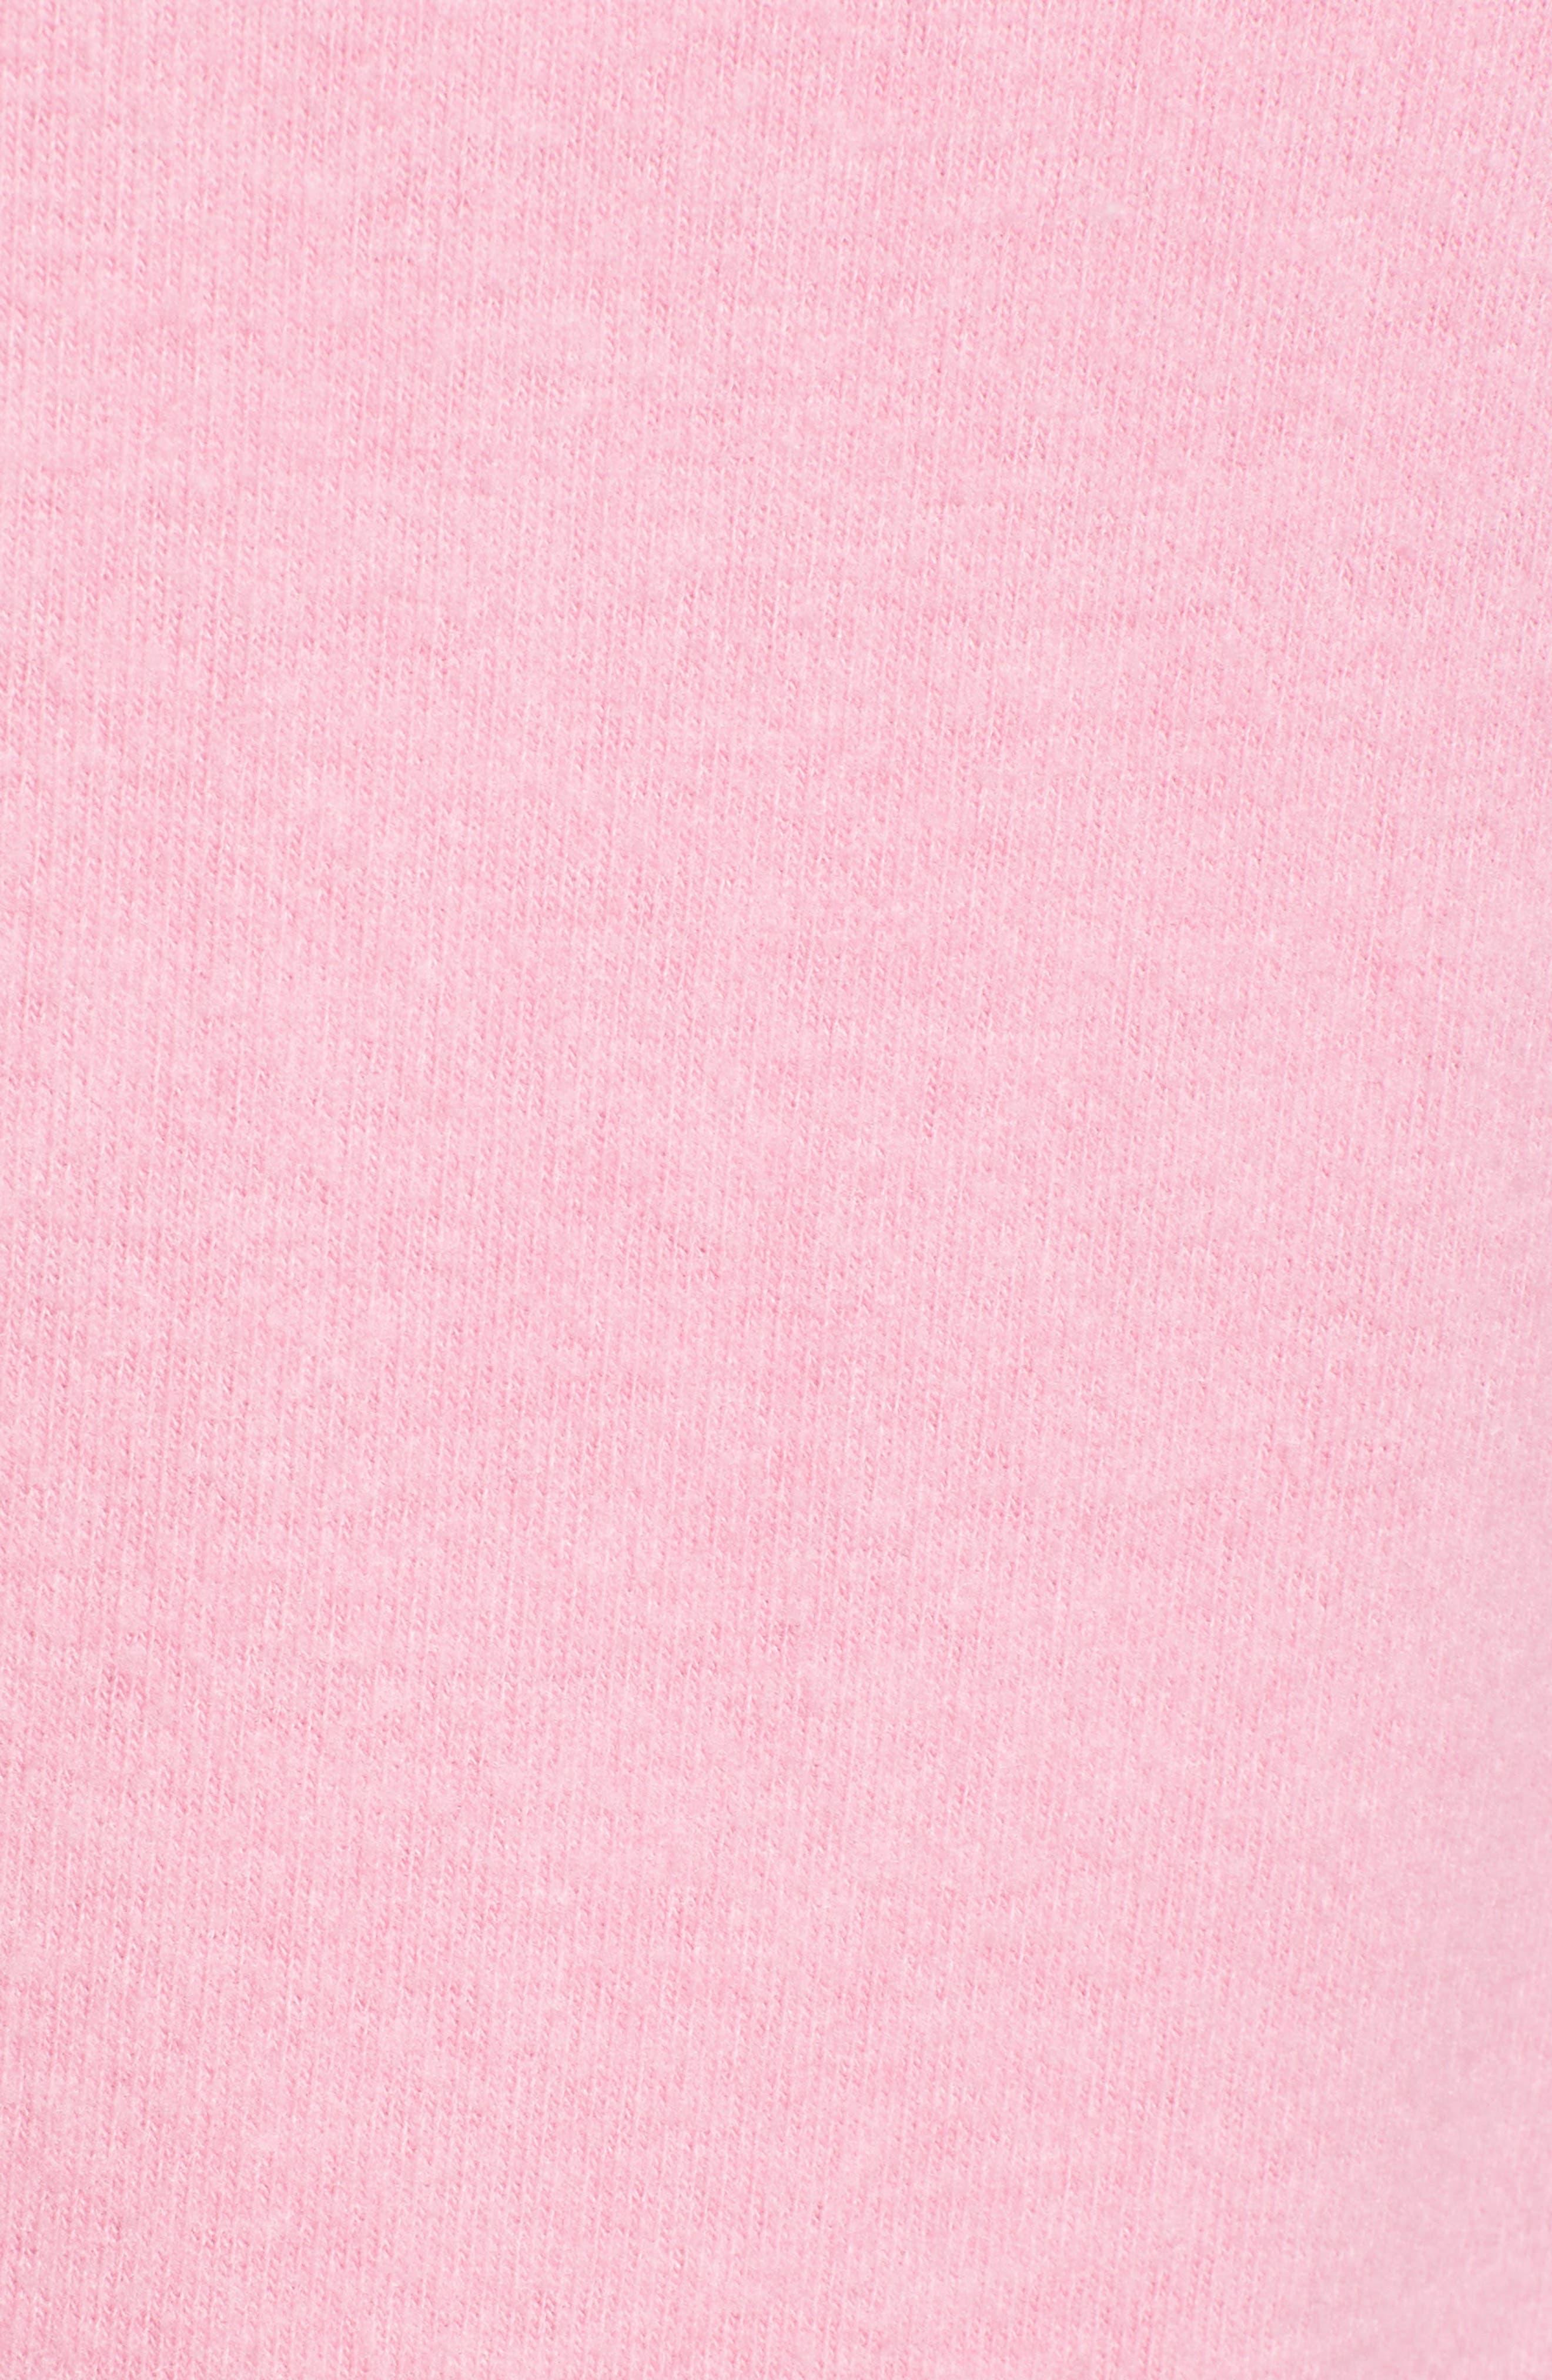 Daydreamer Sweatshirt,                             Alternate thumbnail 5, color,                             650